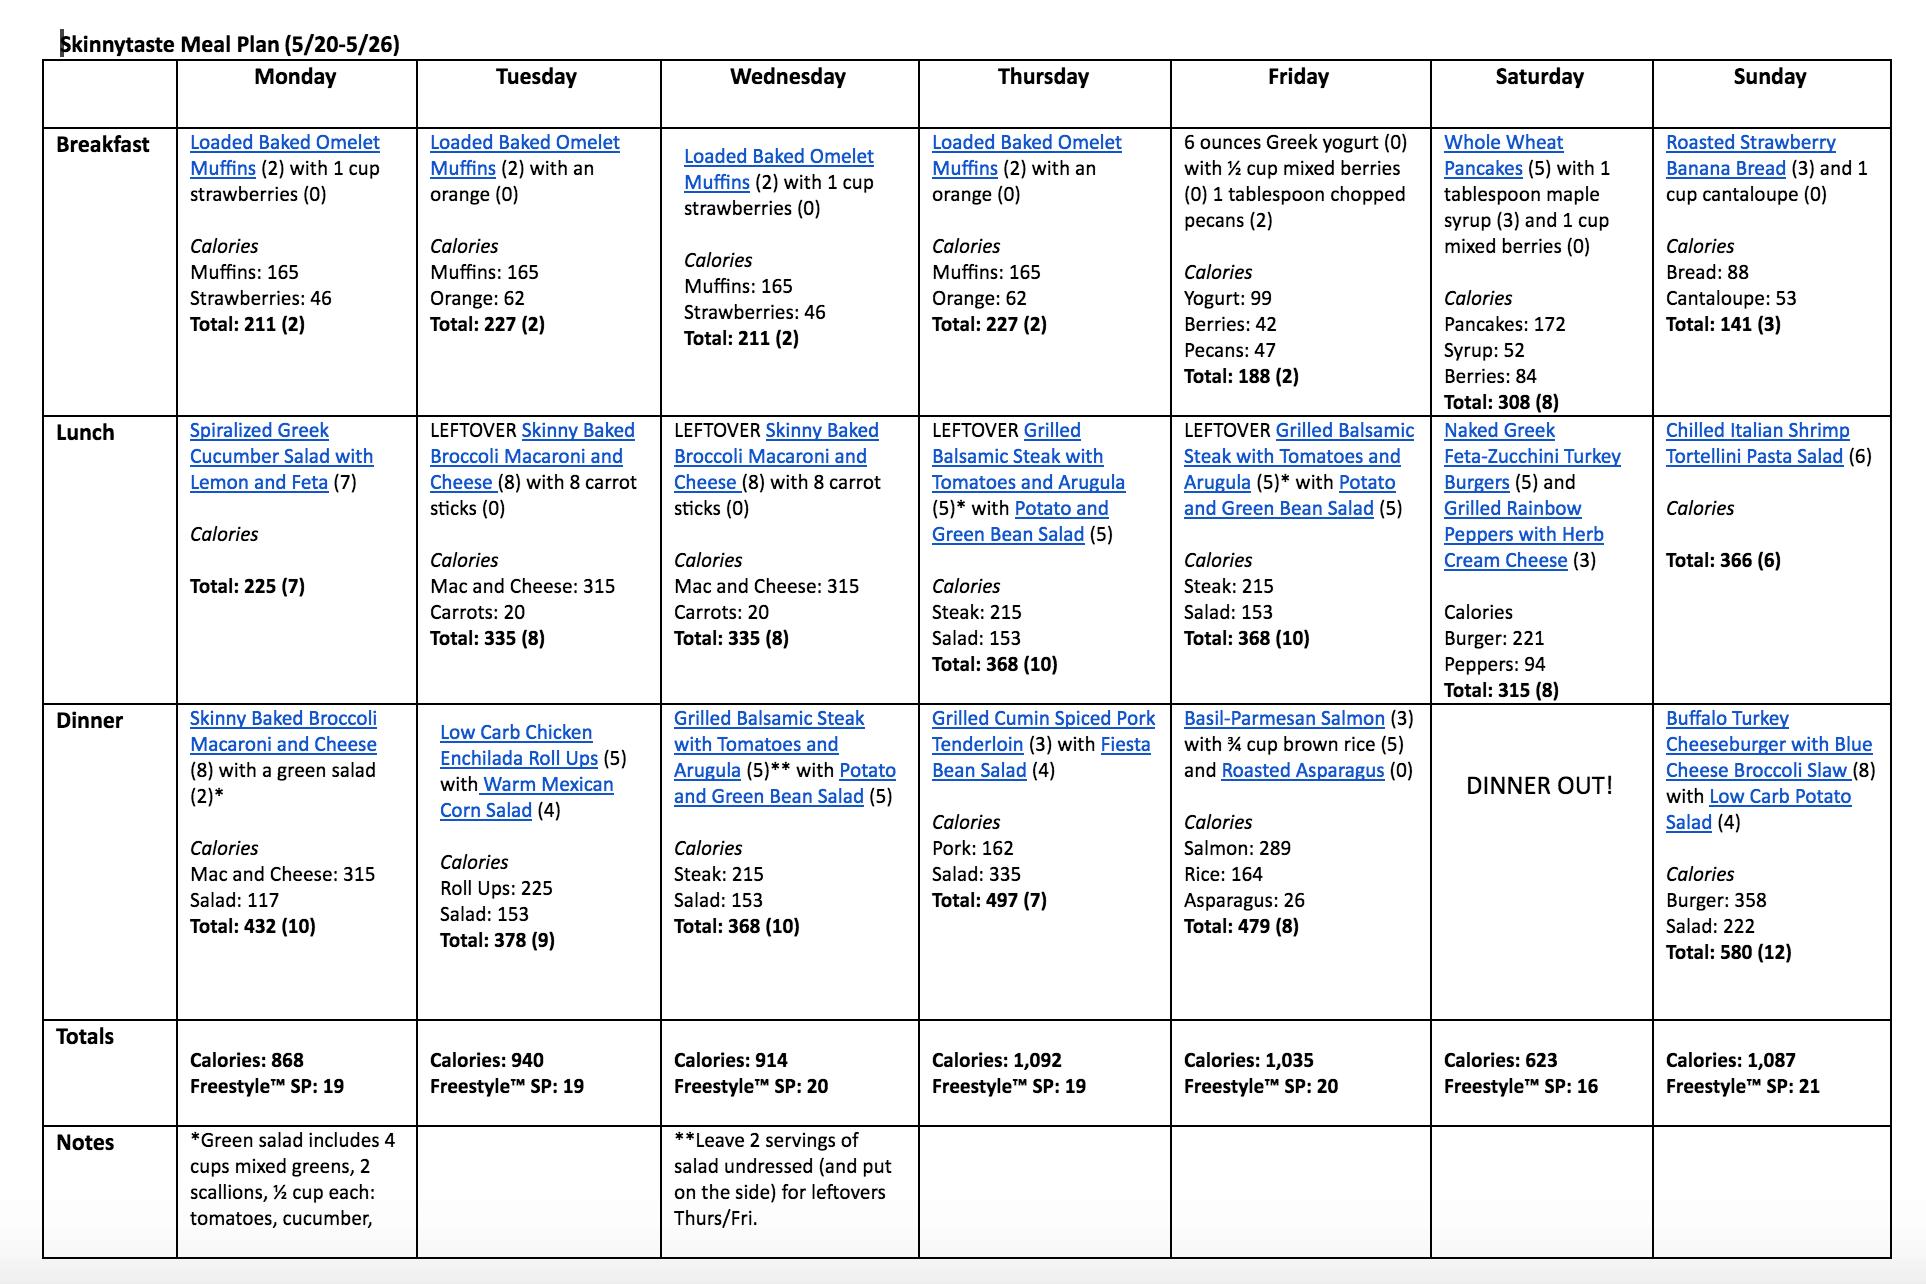 Skinnytaste Meal Plan (May 20-May 26)